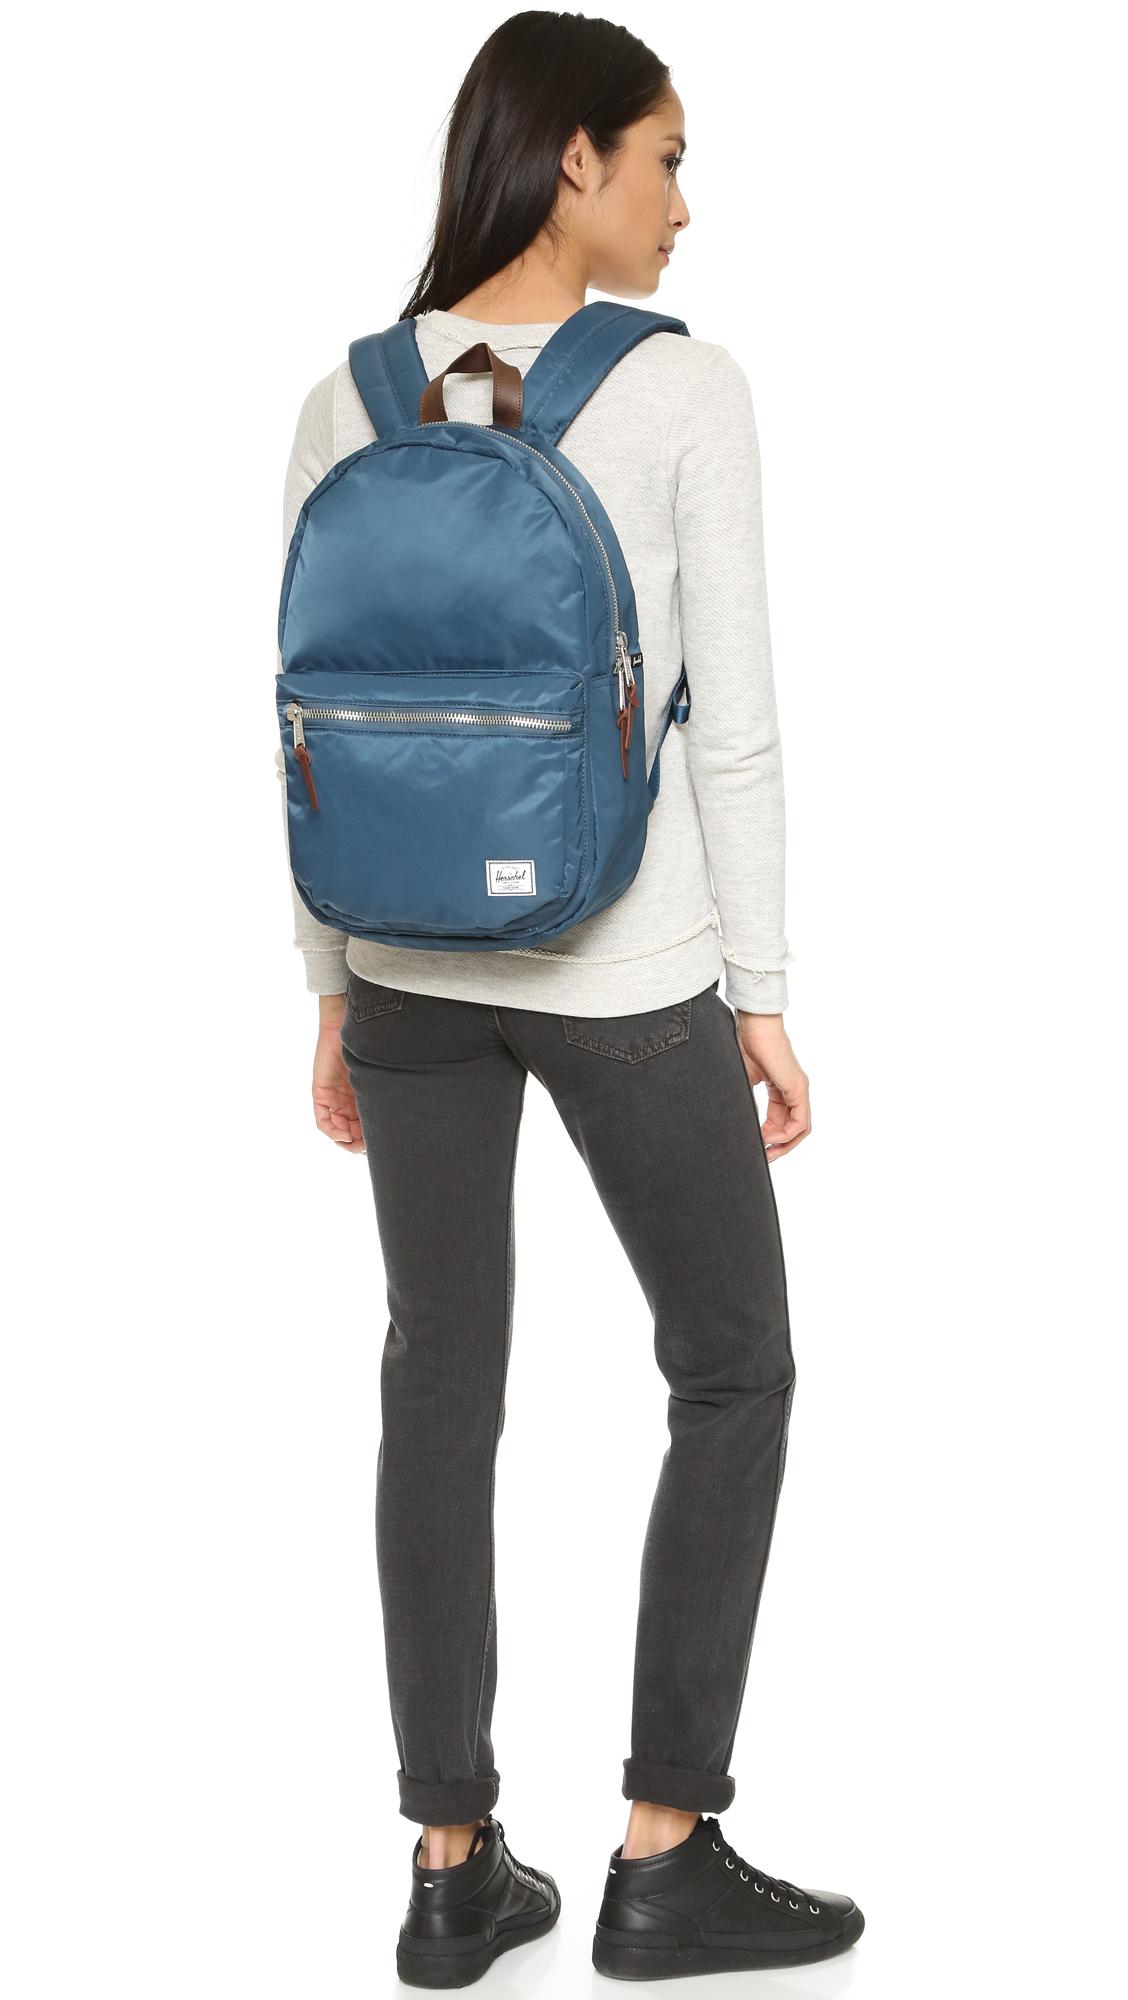 306aebcf7b Herschel Supply Co. Lawson Backpack in Blue - Lyst